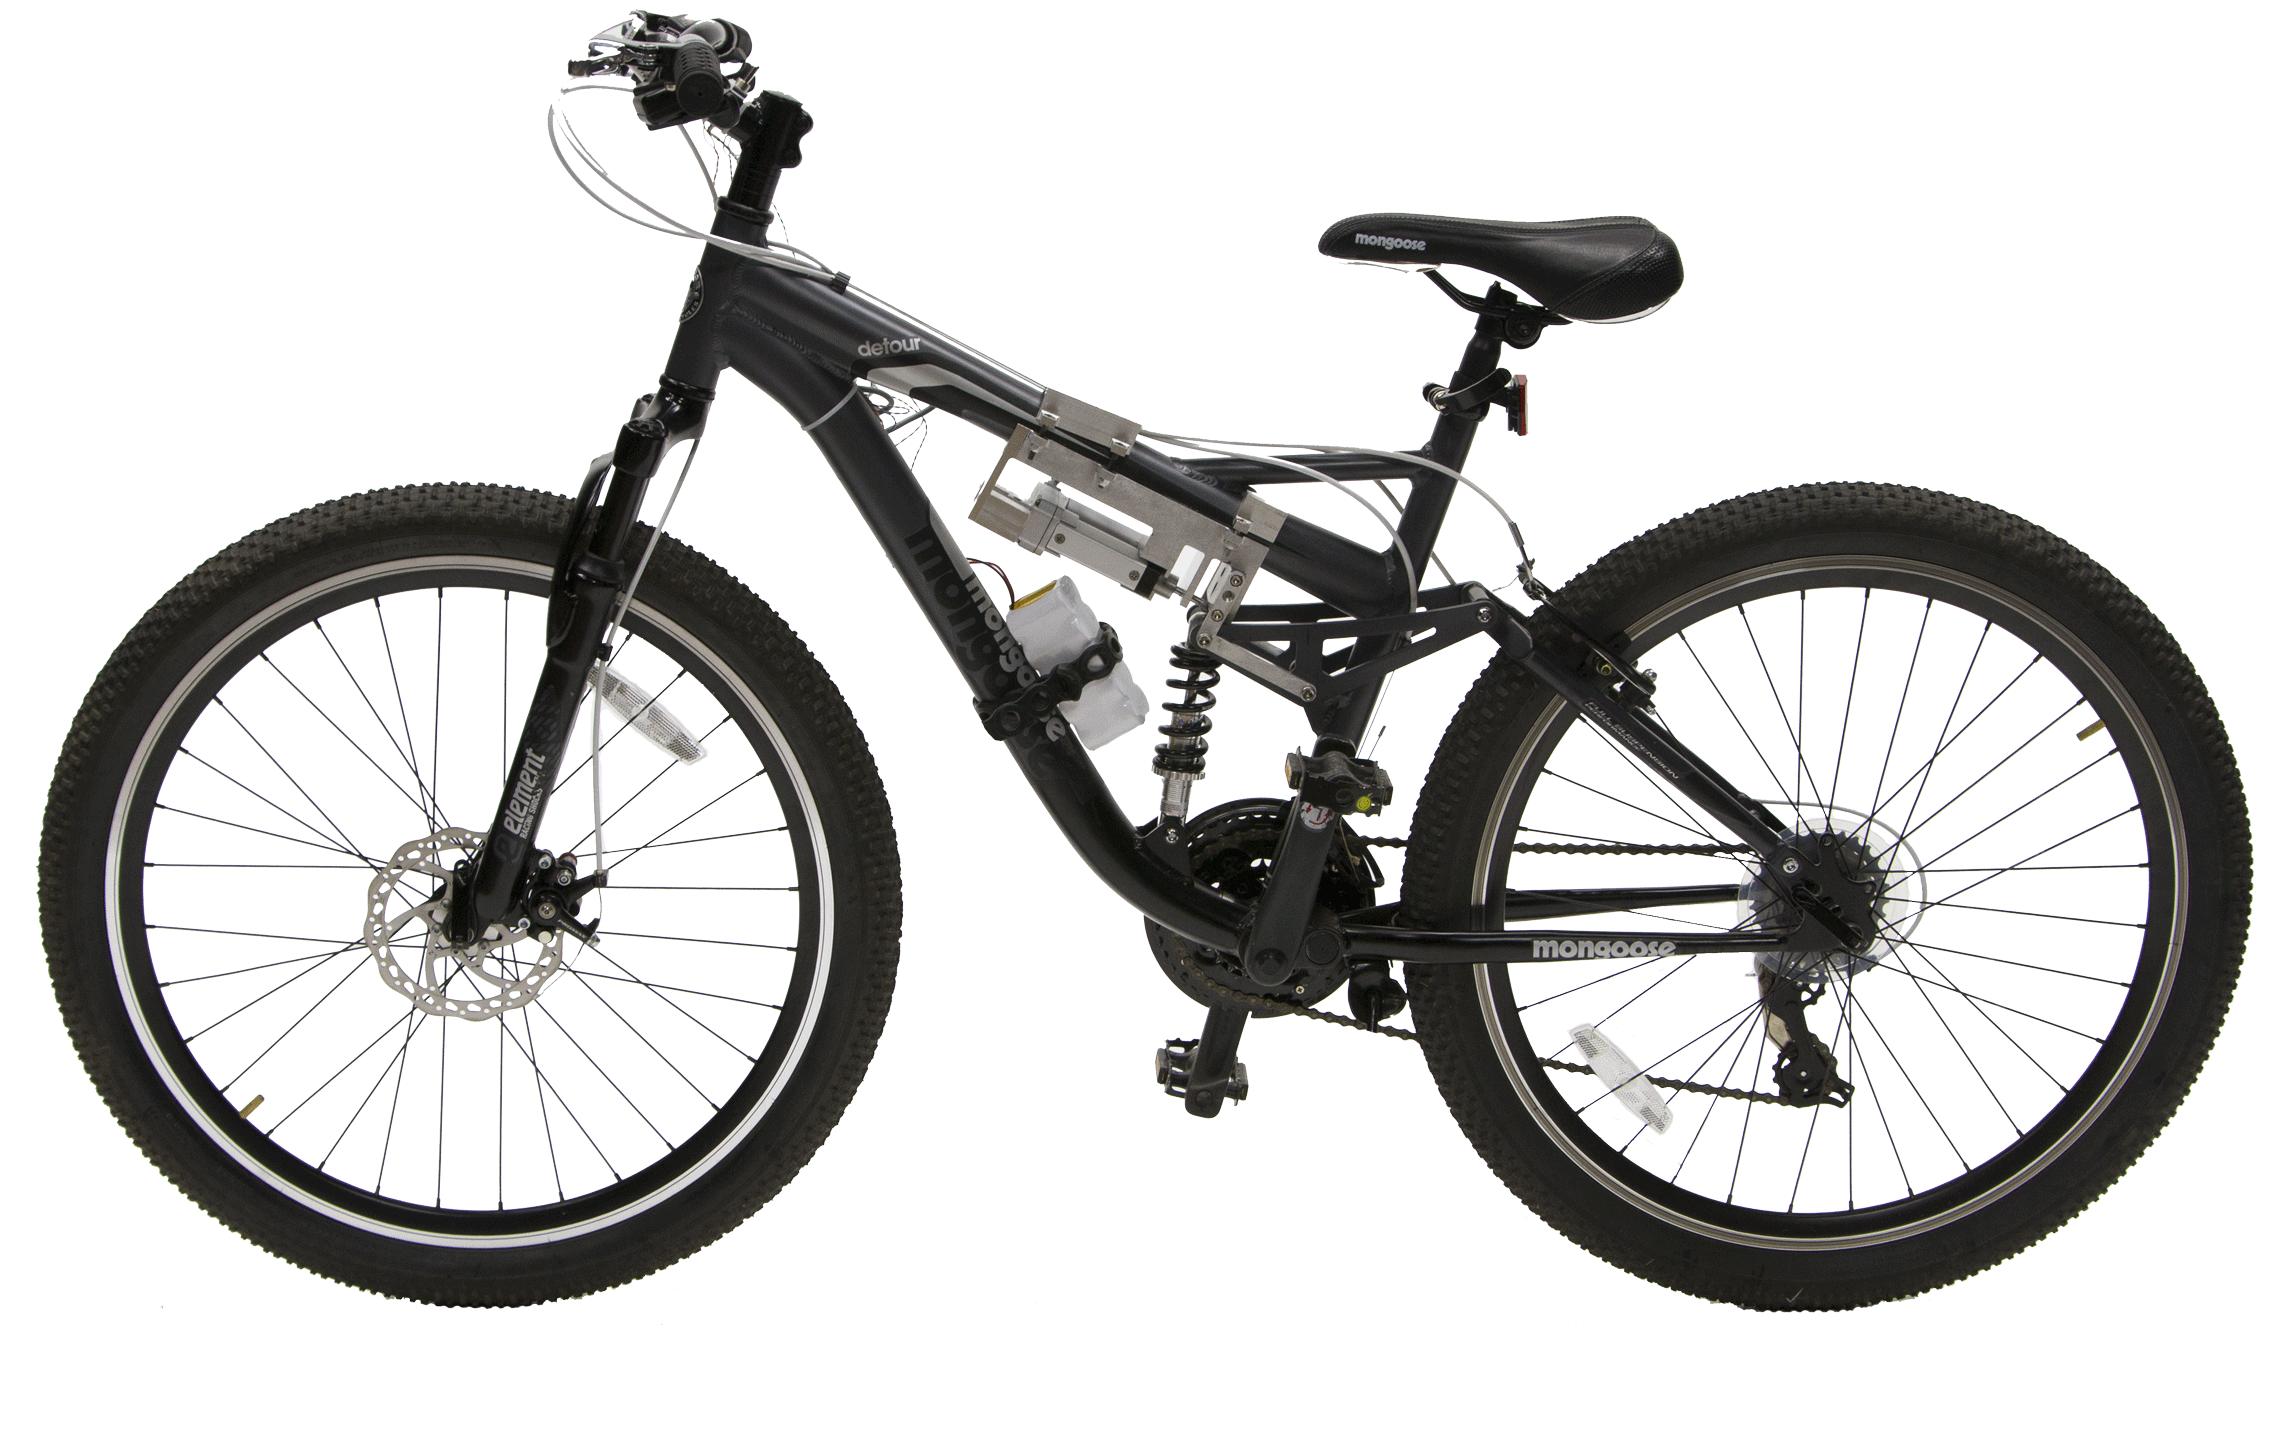 Bicycle Png Image Bicycle Motorcycle Icon Image